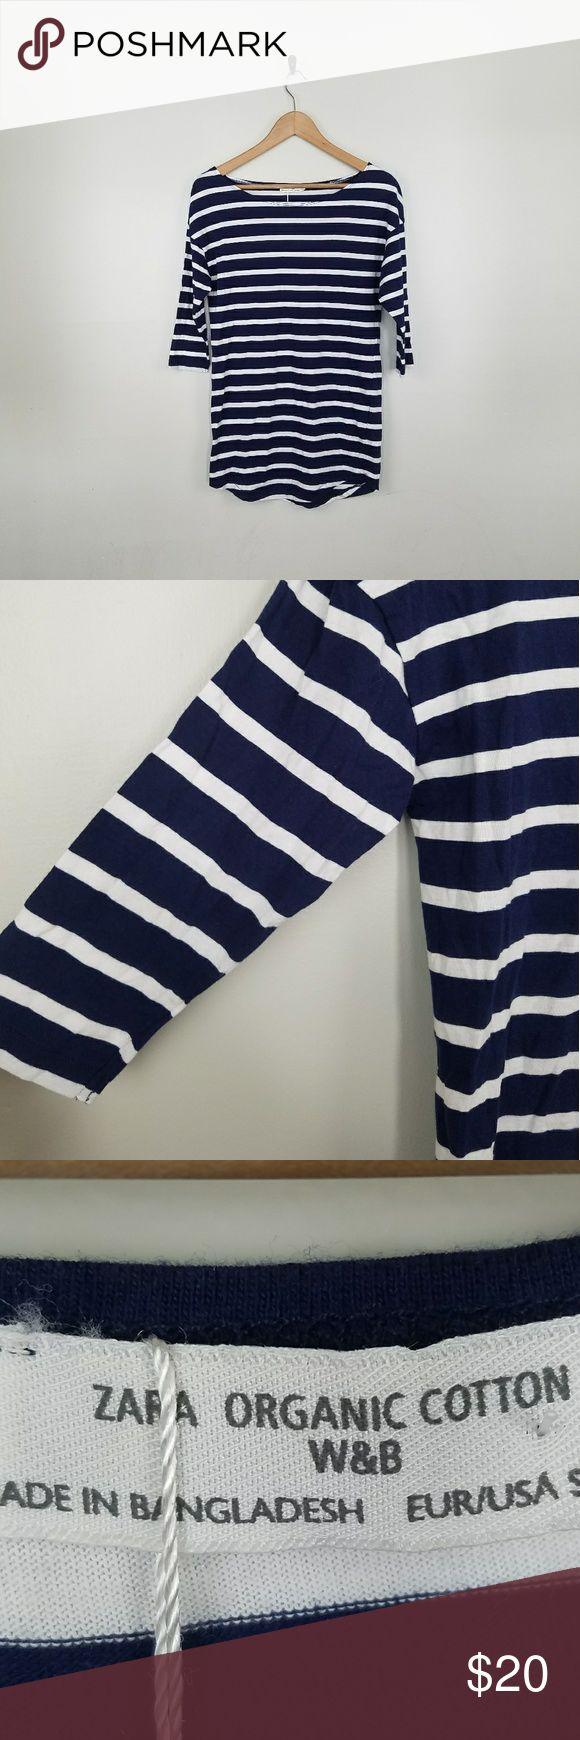 Zara Organic Cotton Blue & White Striped Shirt S Zara women's blue and white striped half sleeve shirt size small armpit to armpit measures 20 in armpit to hem measures 20 in  new with tags Zara Tops Blouses